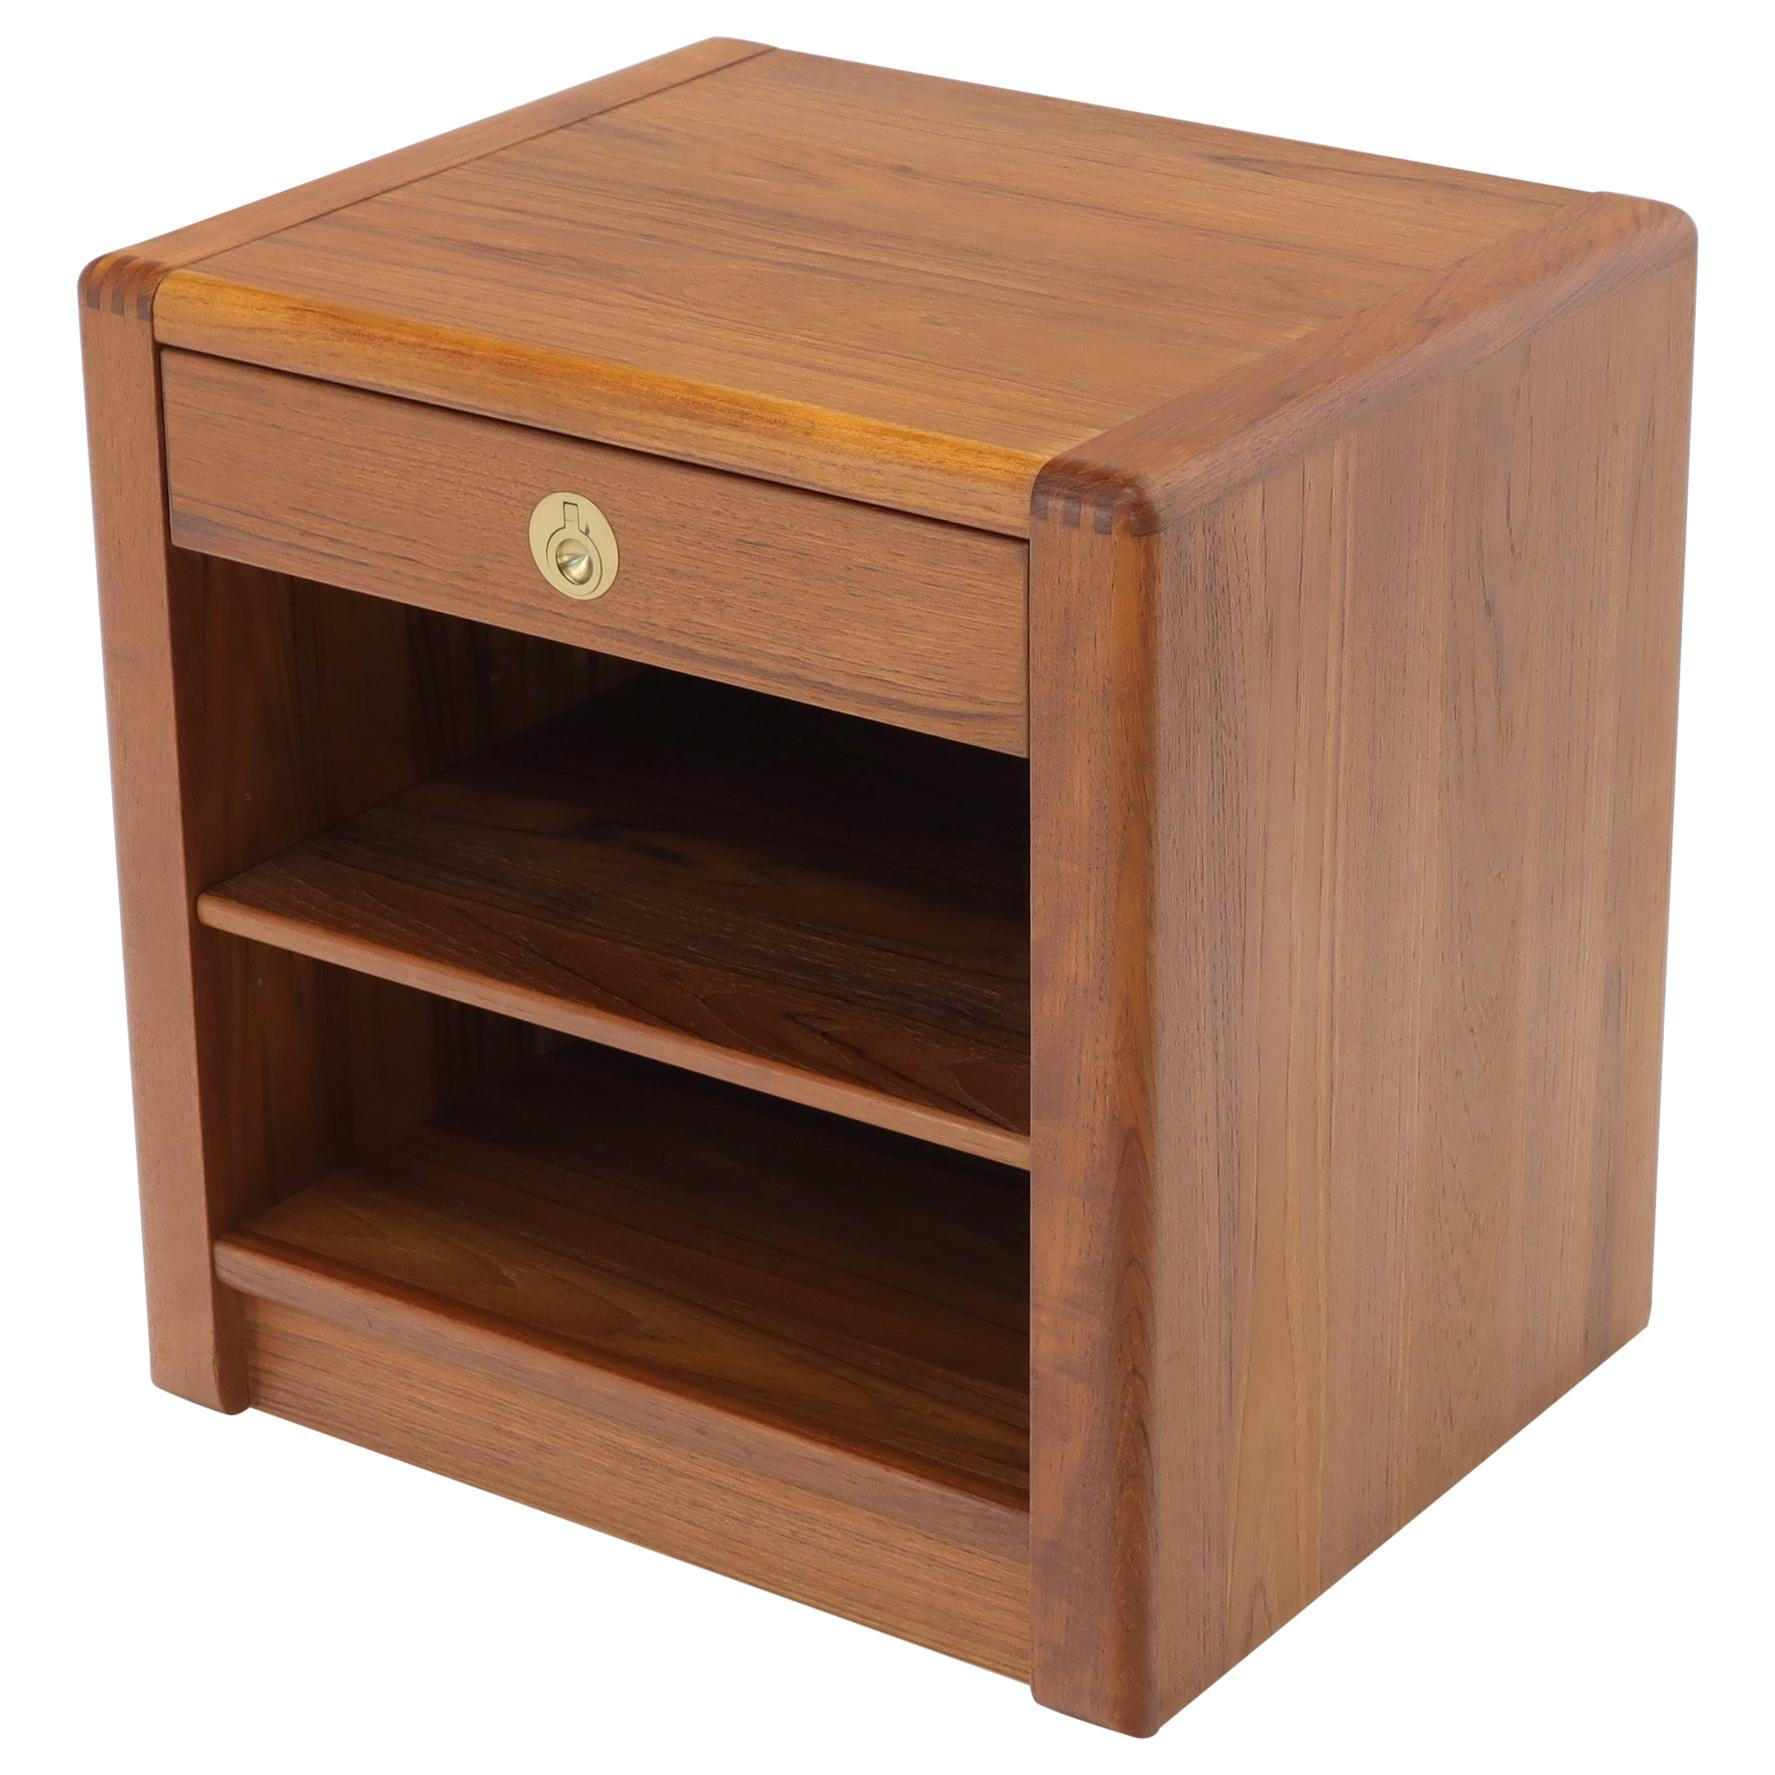 Danish Mid-Century Modern Teak One-Drawer End Table Stand